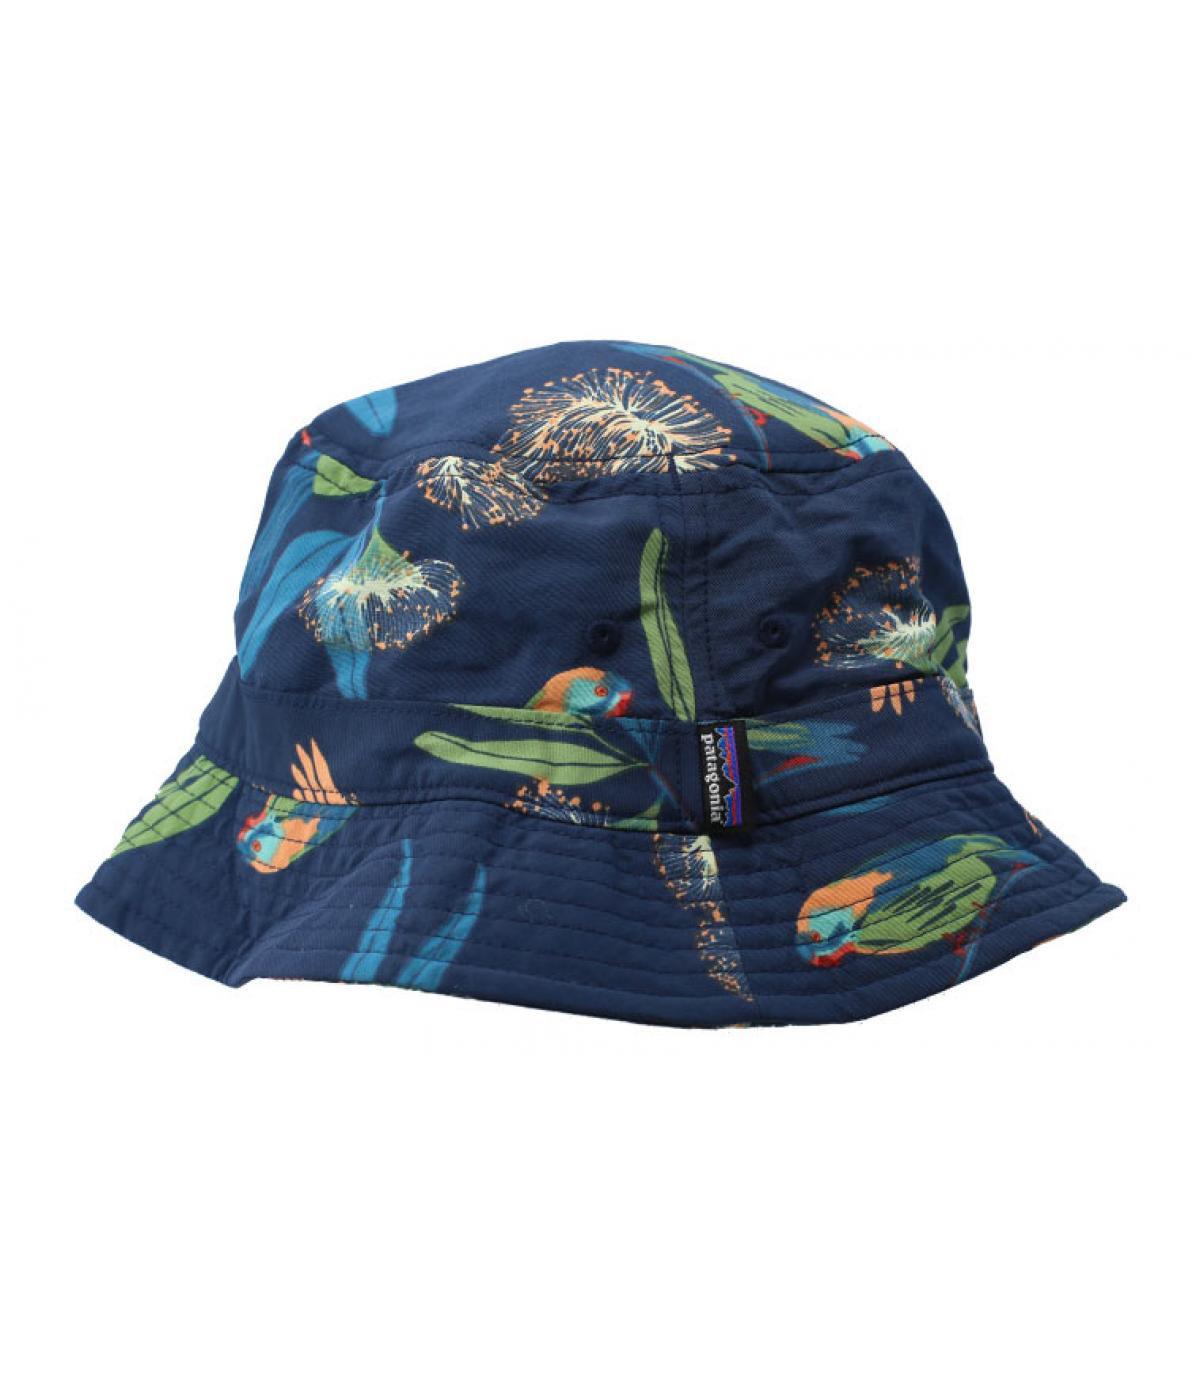 printed Patagonia bucket hat - Wavefarer Bucket Parrots stone blue ... f833ea6e7a4f